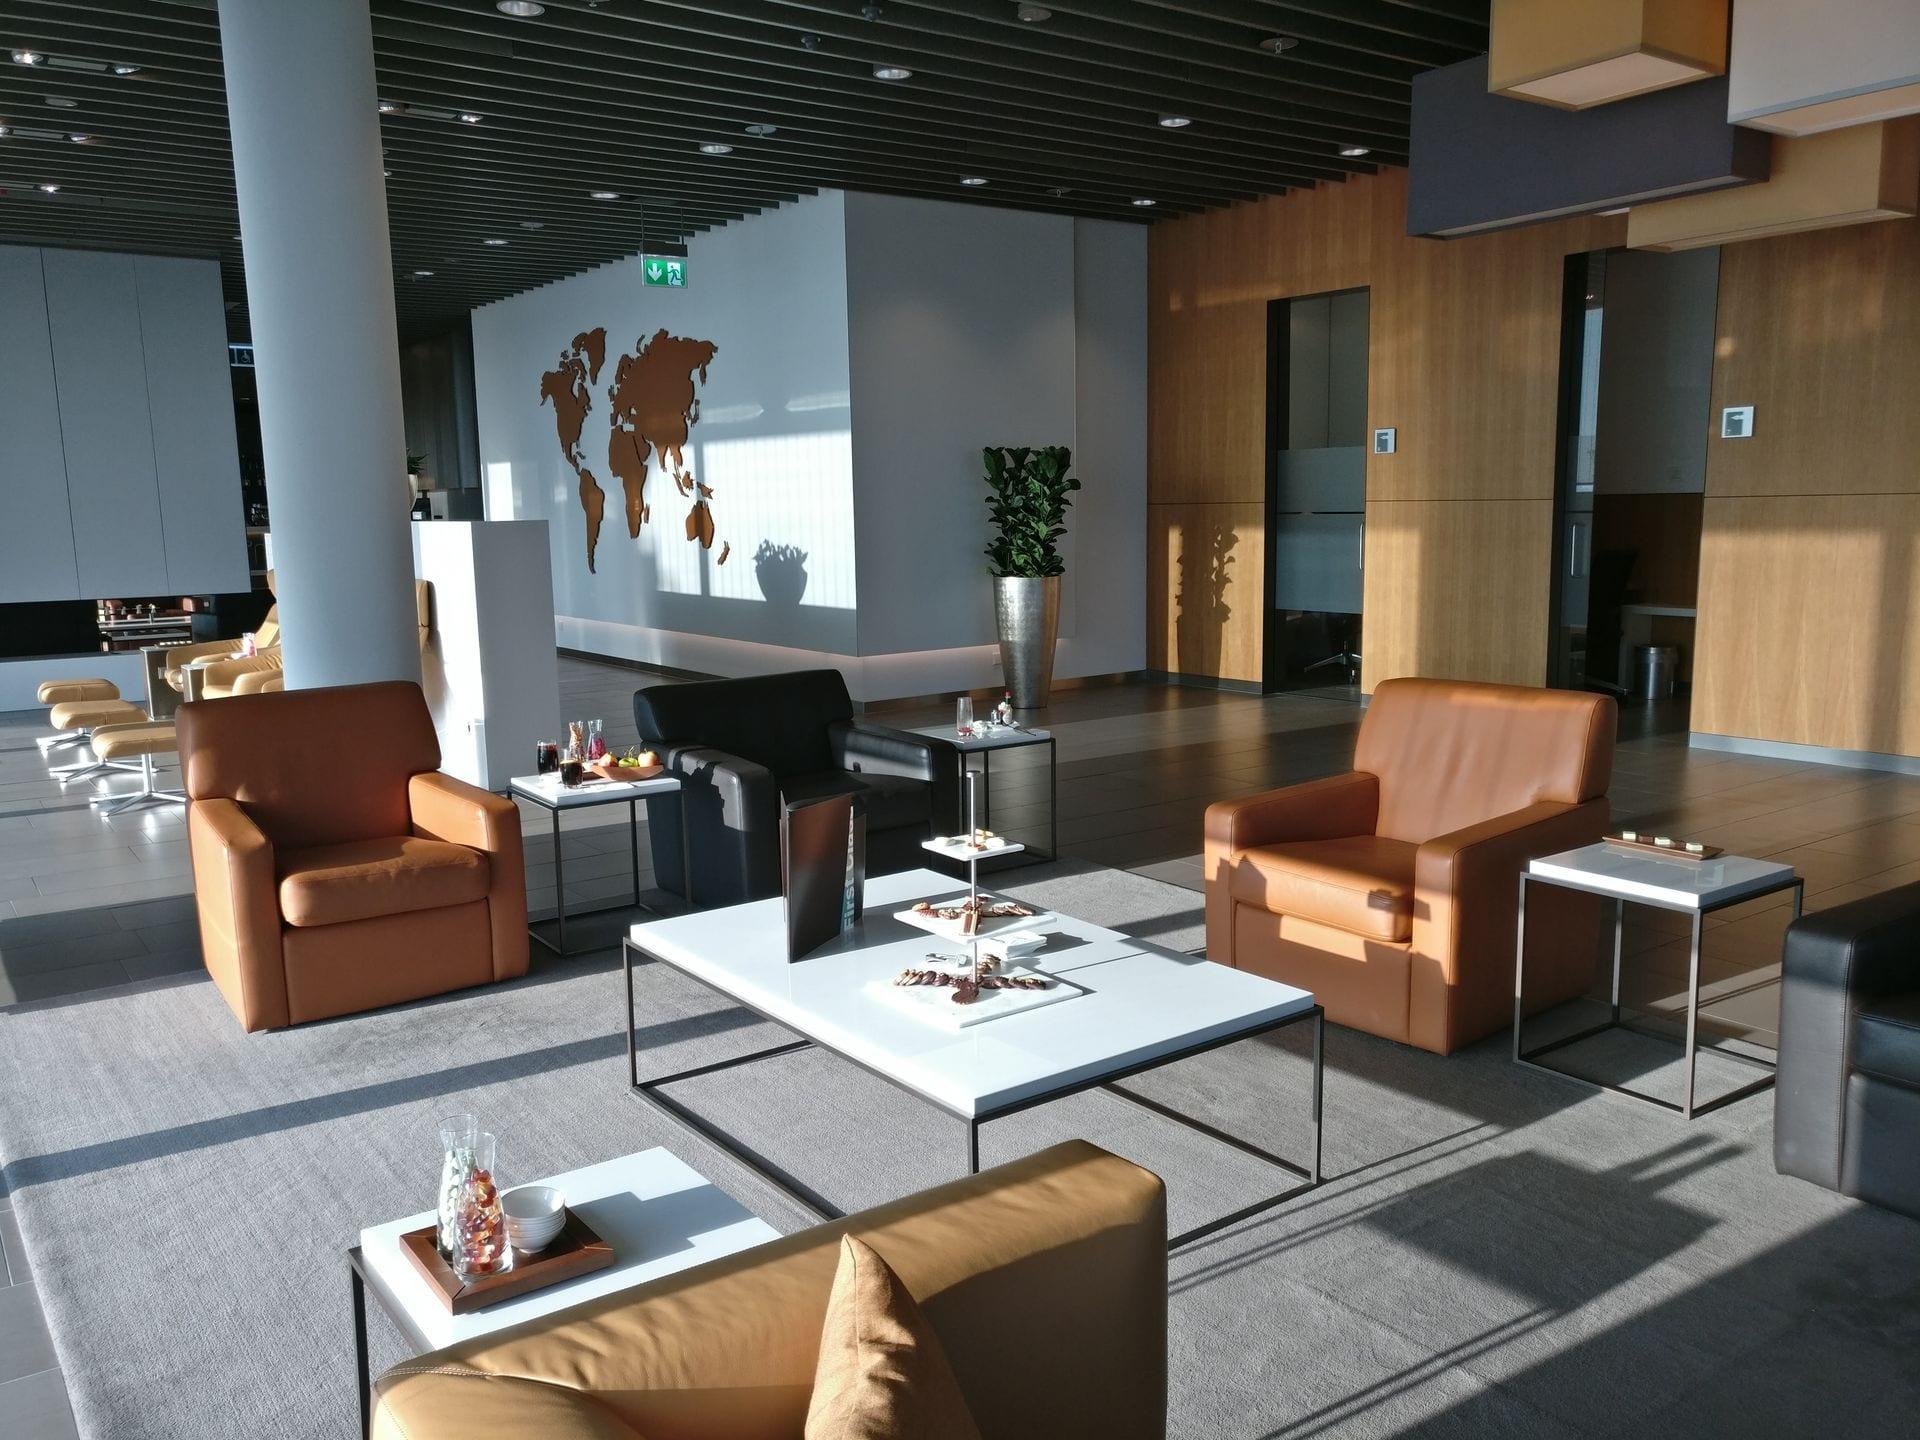 Lufthansa First Class Lounge Munich Seating